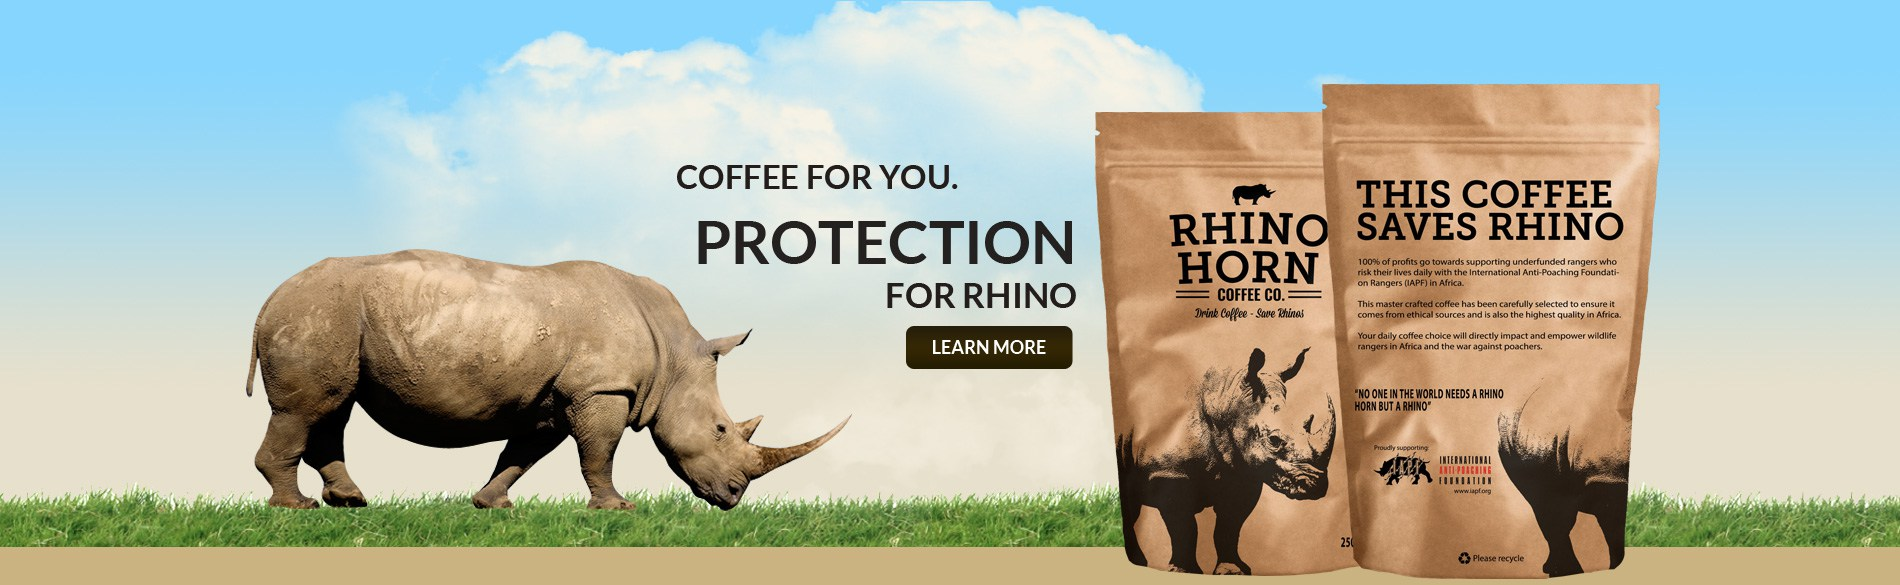 rhinohorncoffee.jpg